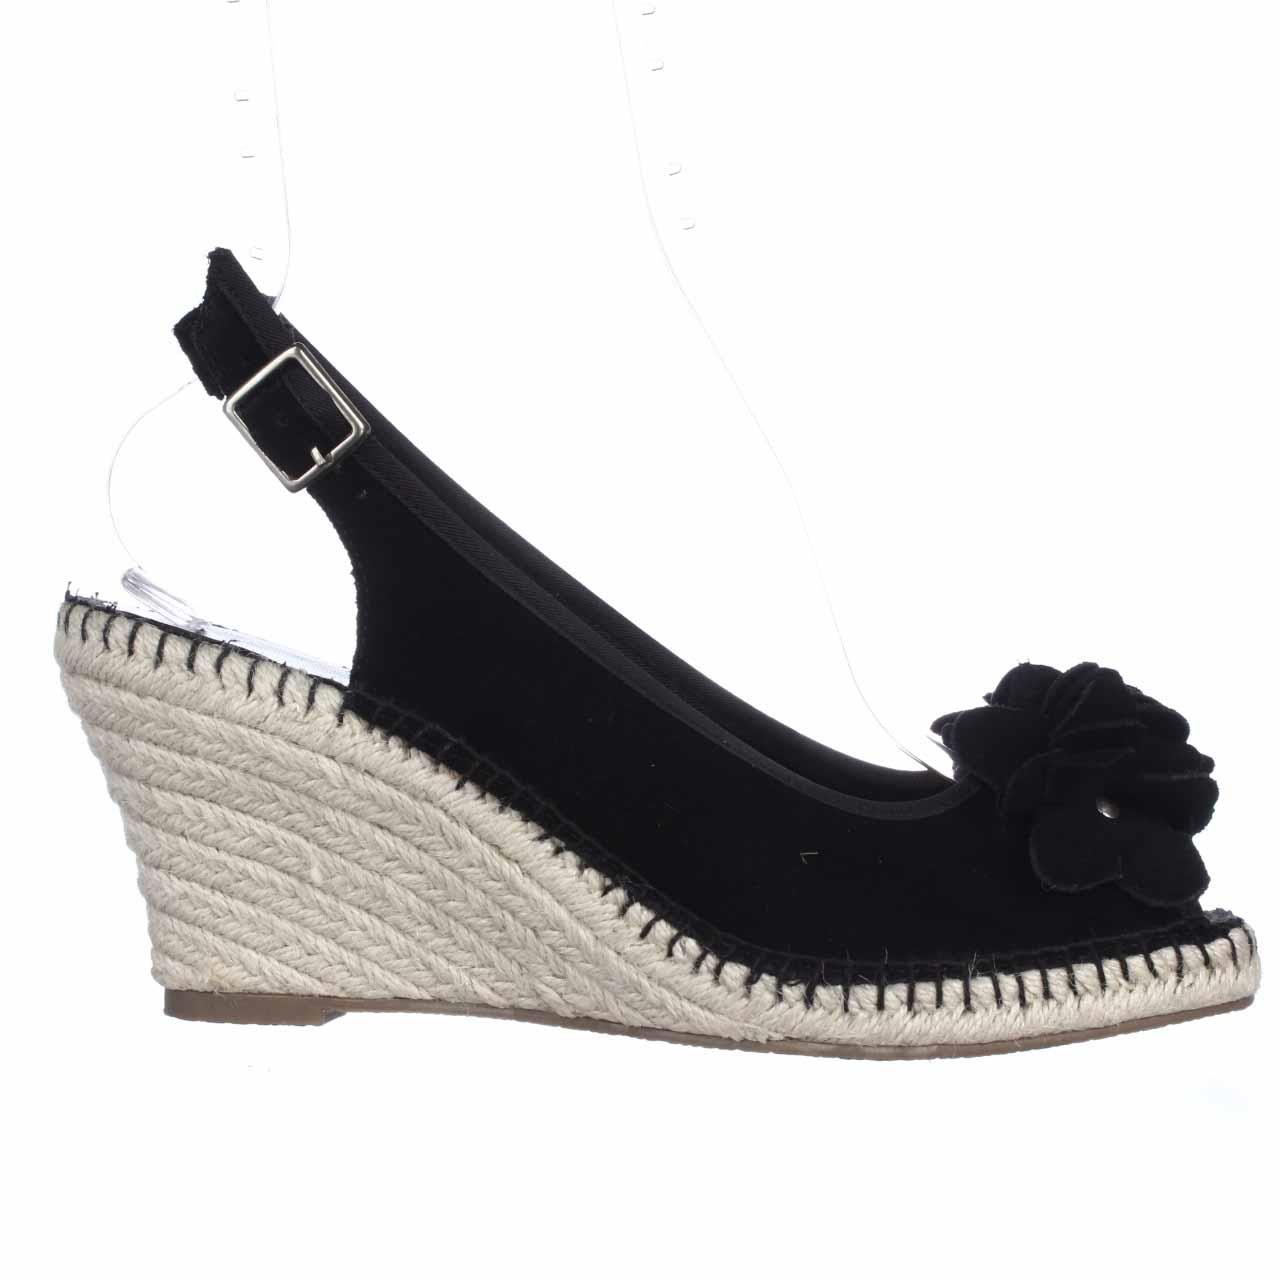 bandolino cordelia espadrille slingback wedge sandals in